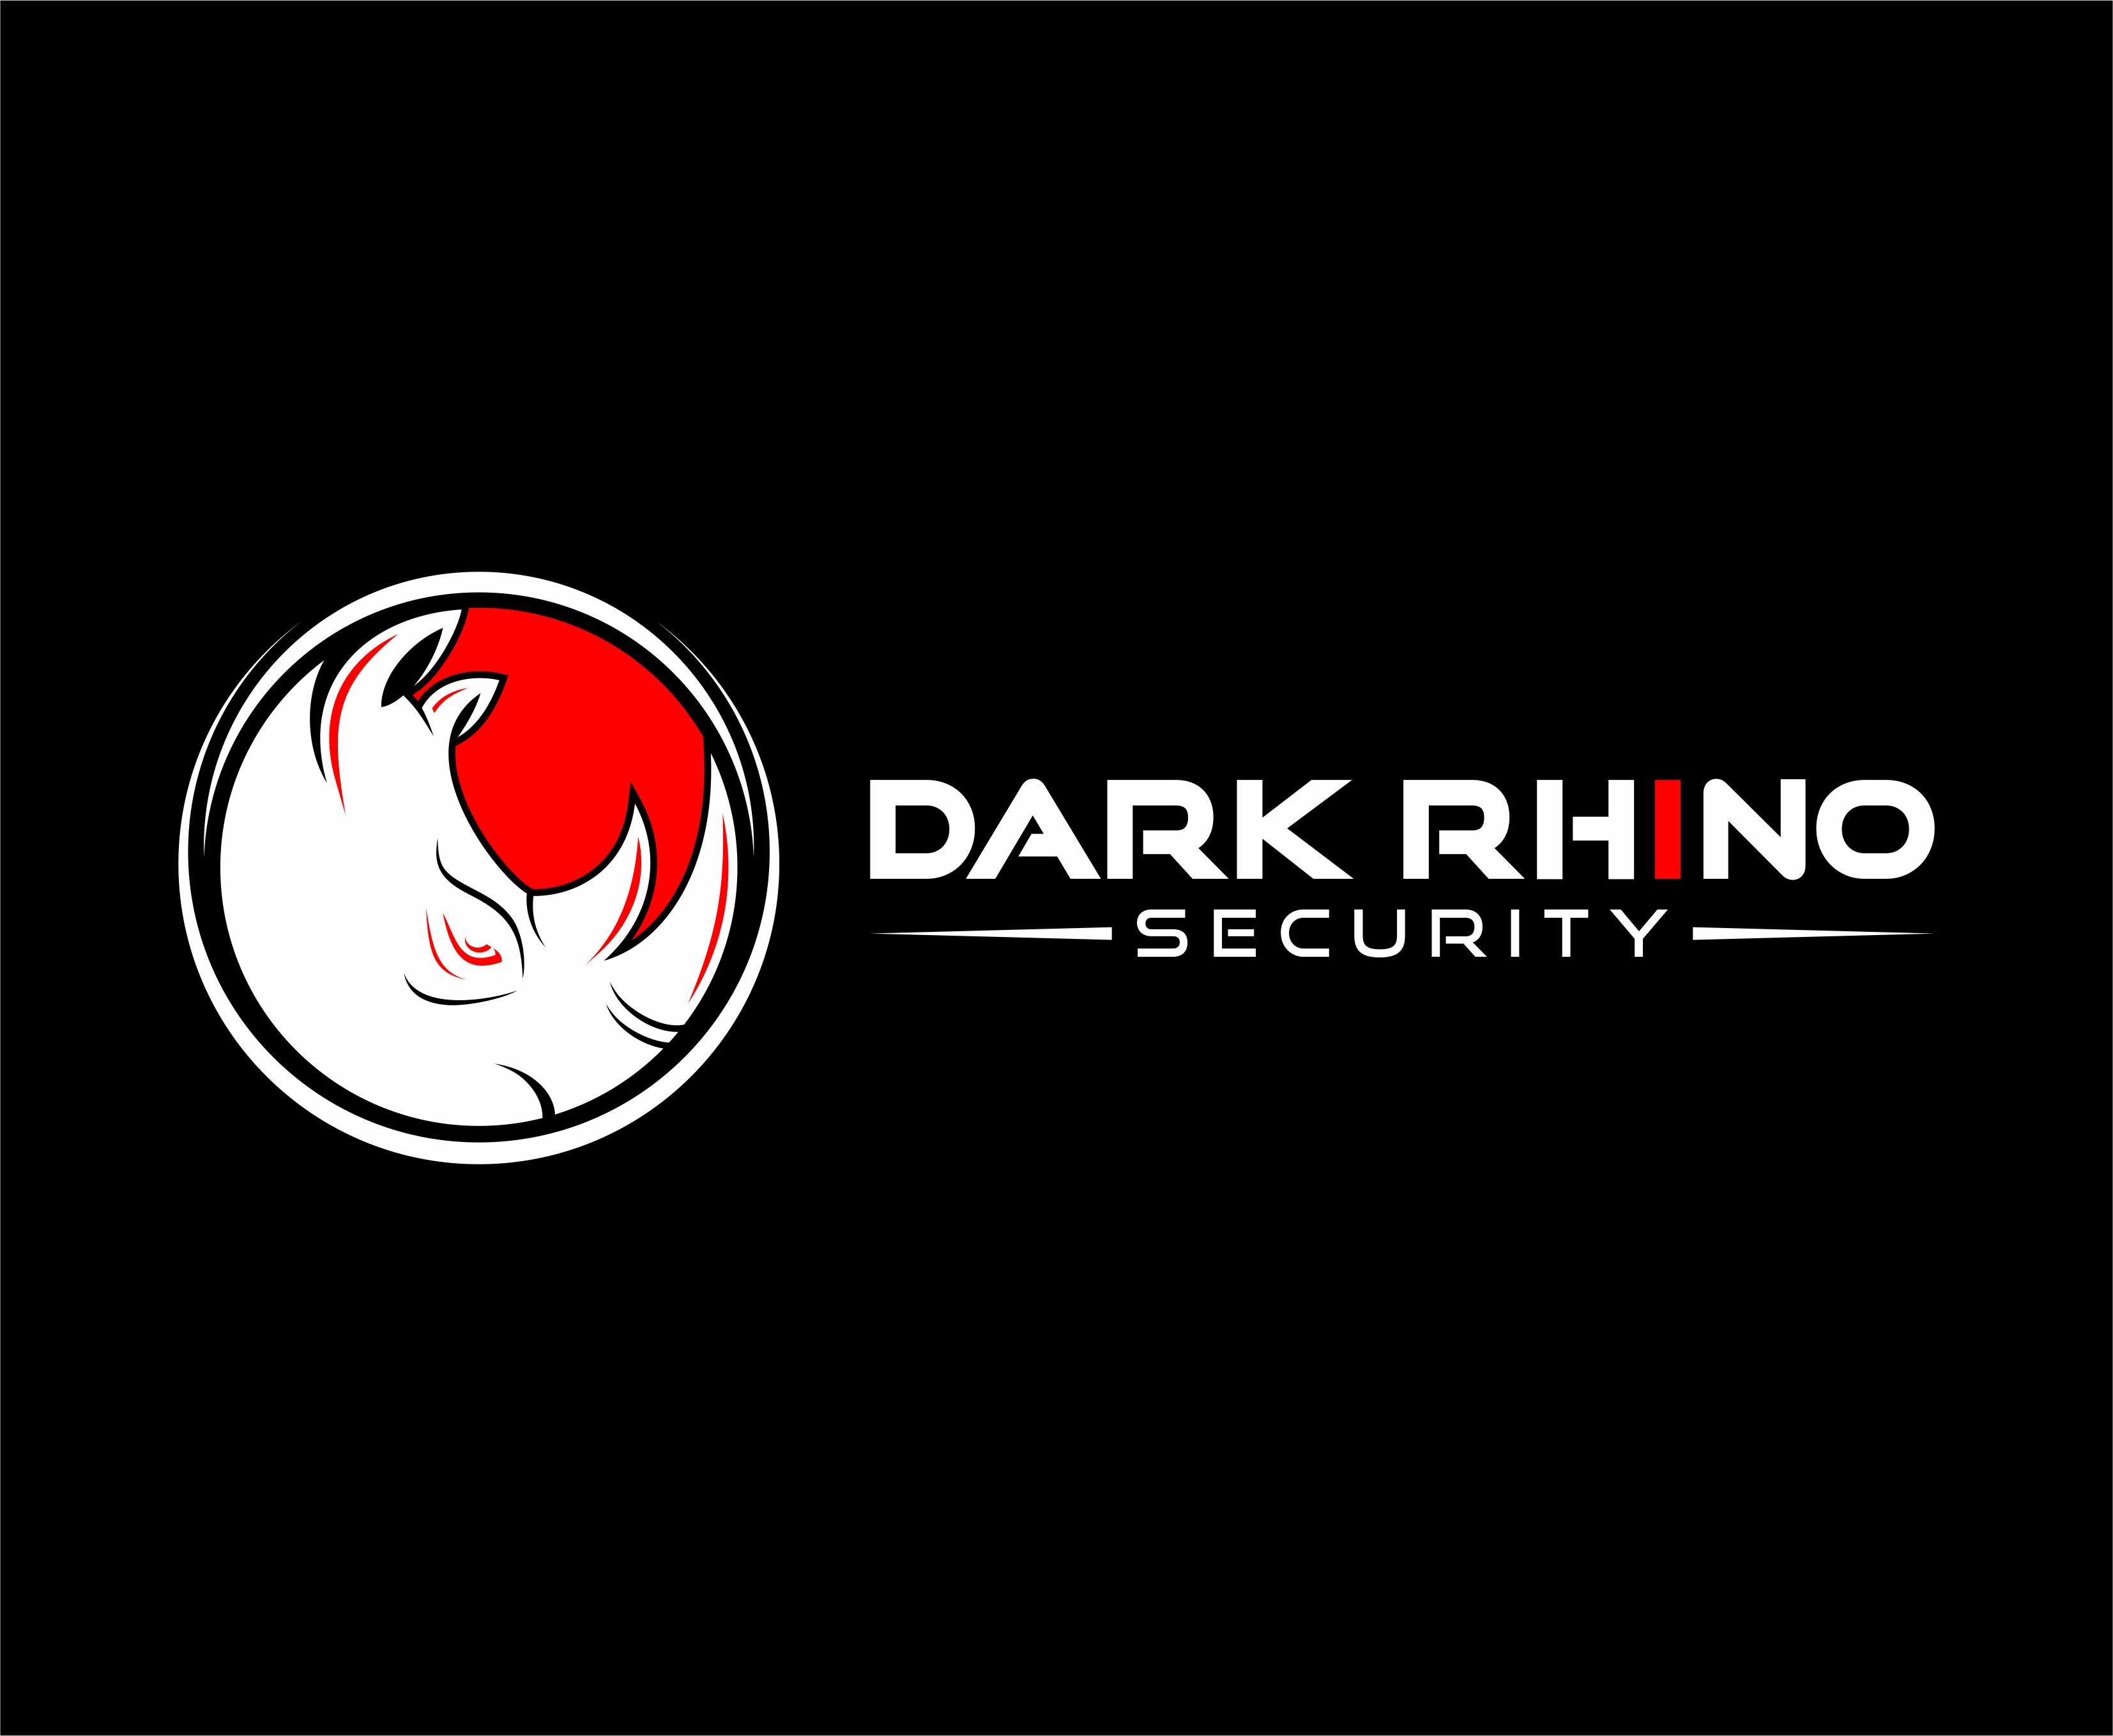 H) DARK RHINO SECURITY LOGO PNG FORMAT